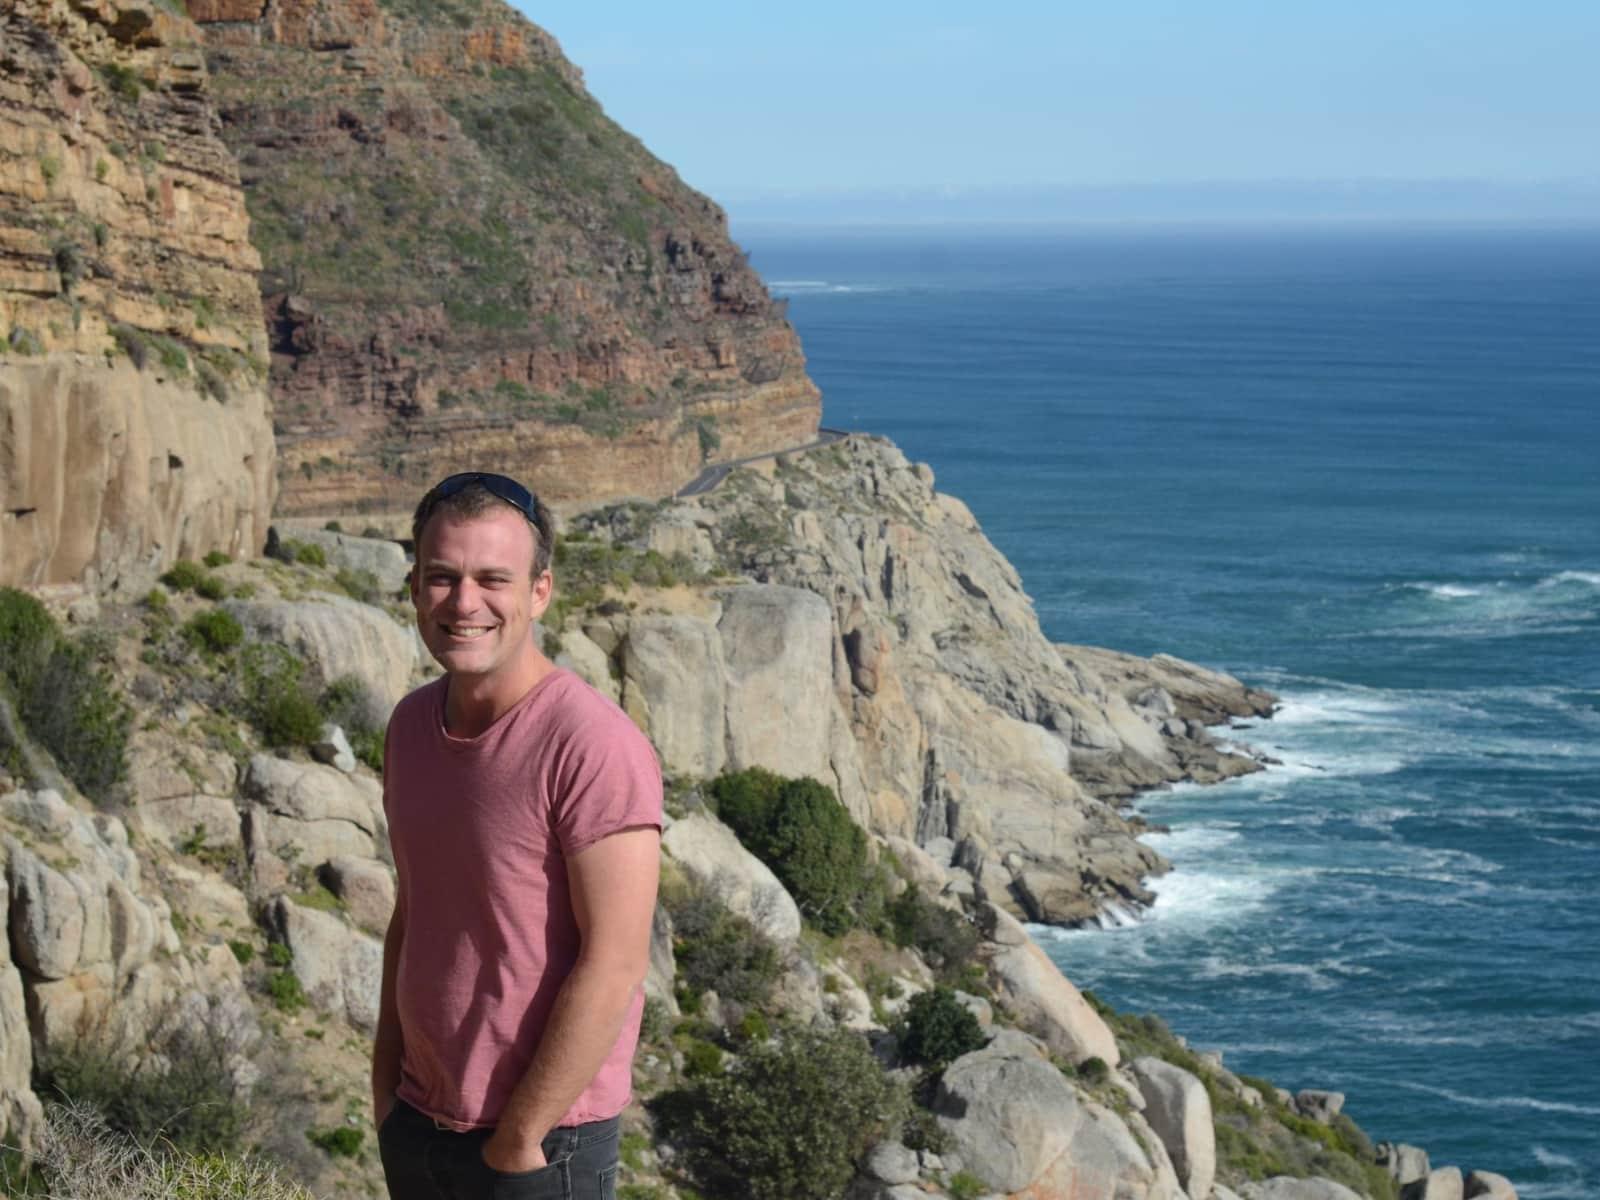 Richard from Sydney, New South Wales, Australia